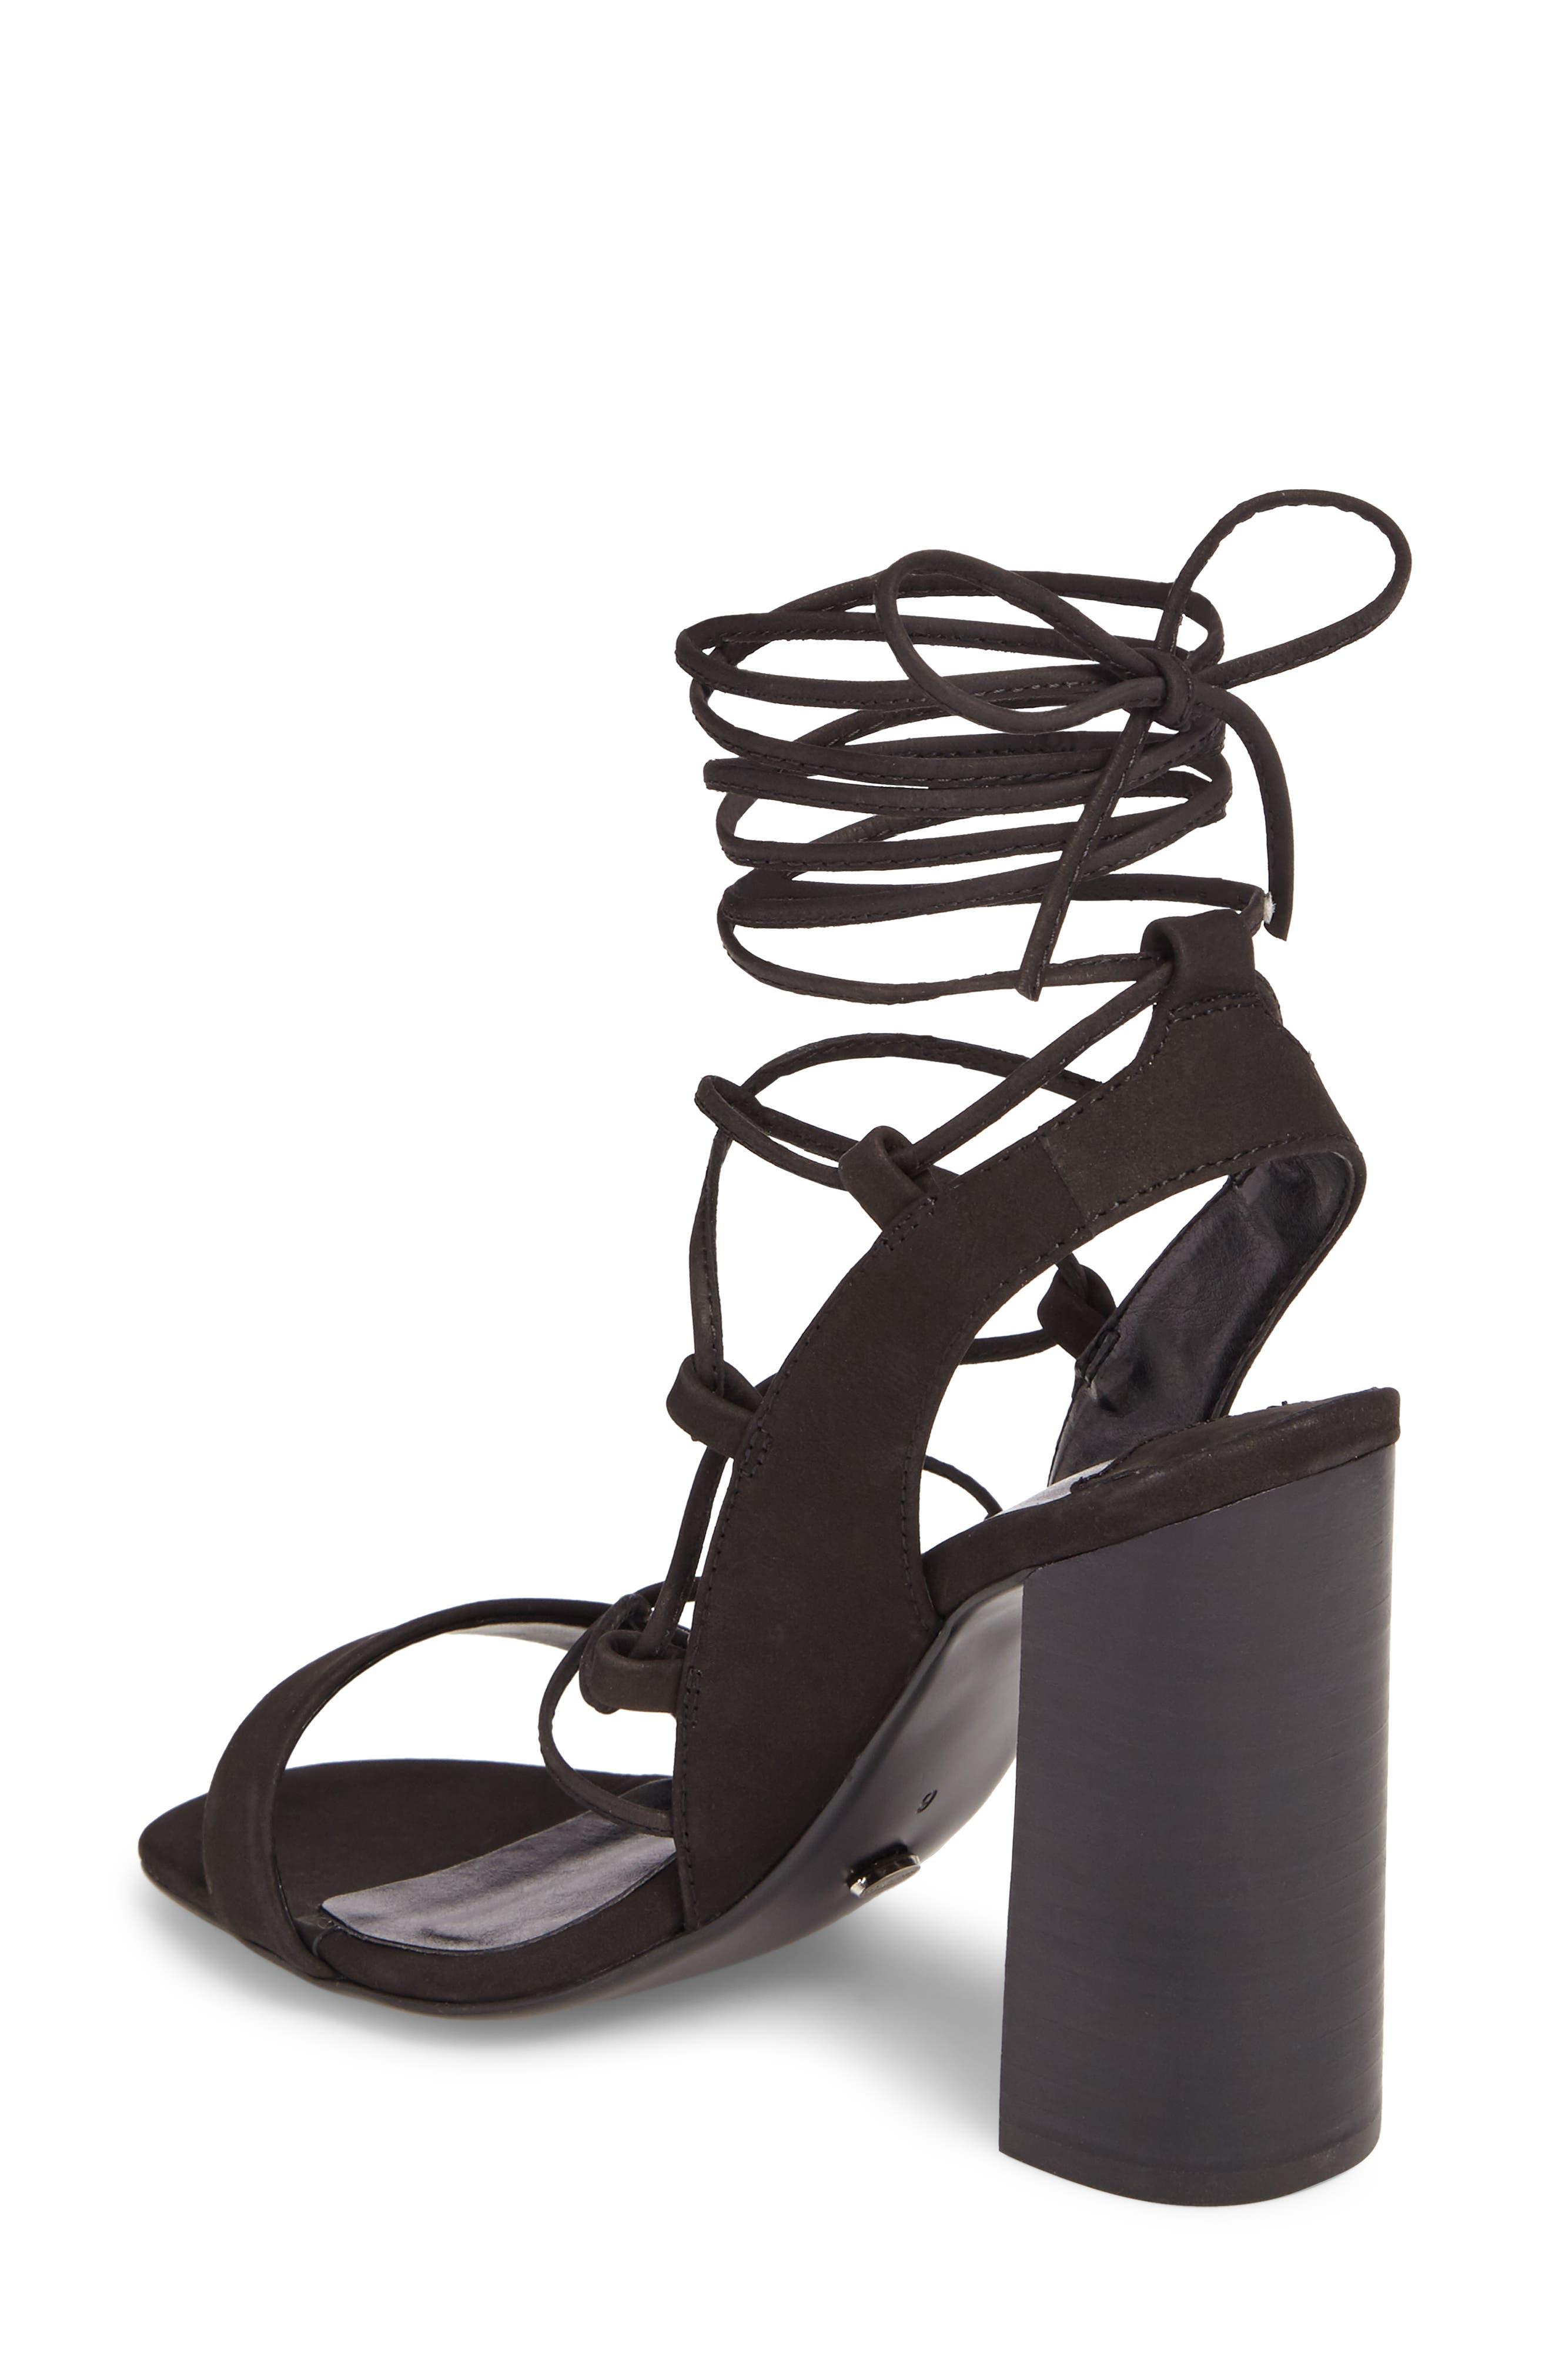 Dani Ghillie Flared Heel Sandal,                             Alternate thumbnail 2, color,                             Black Phoenix Nubuck Leather